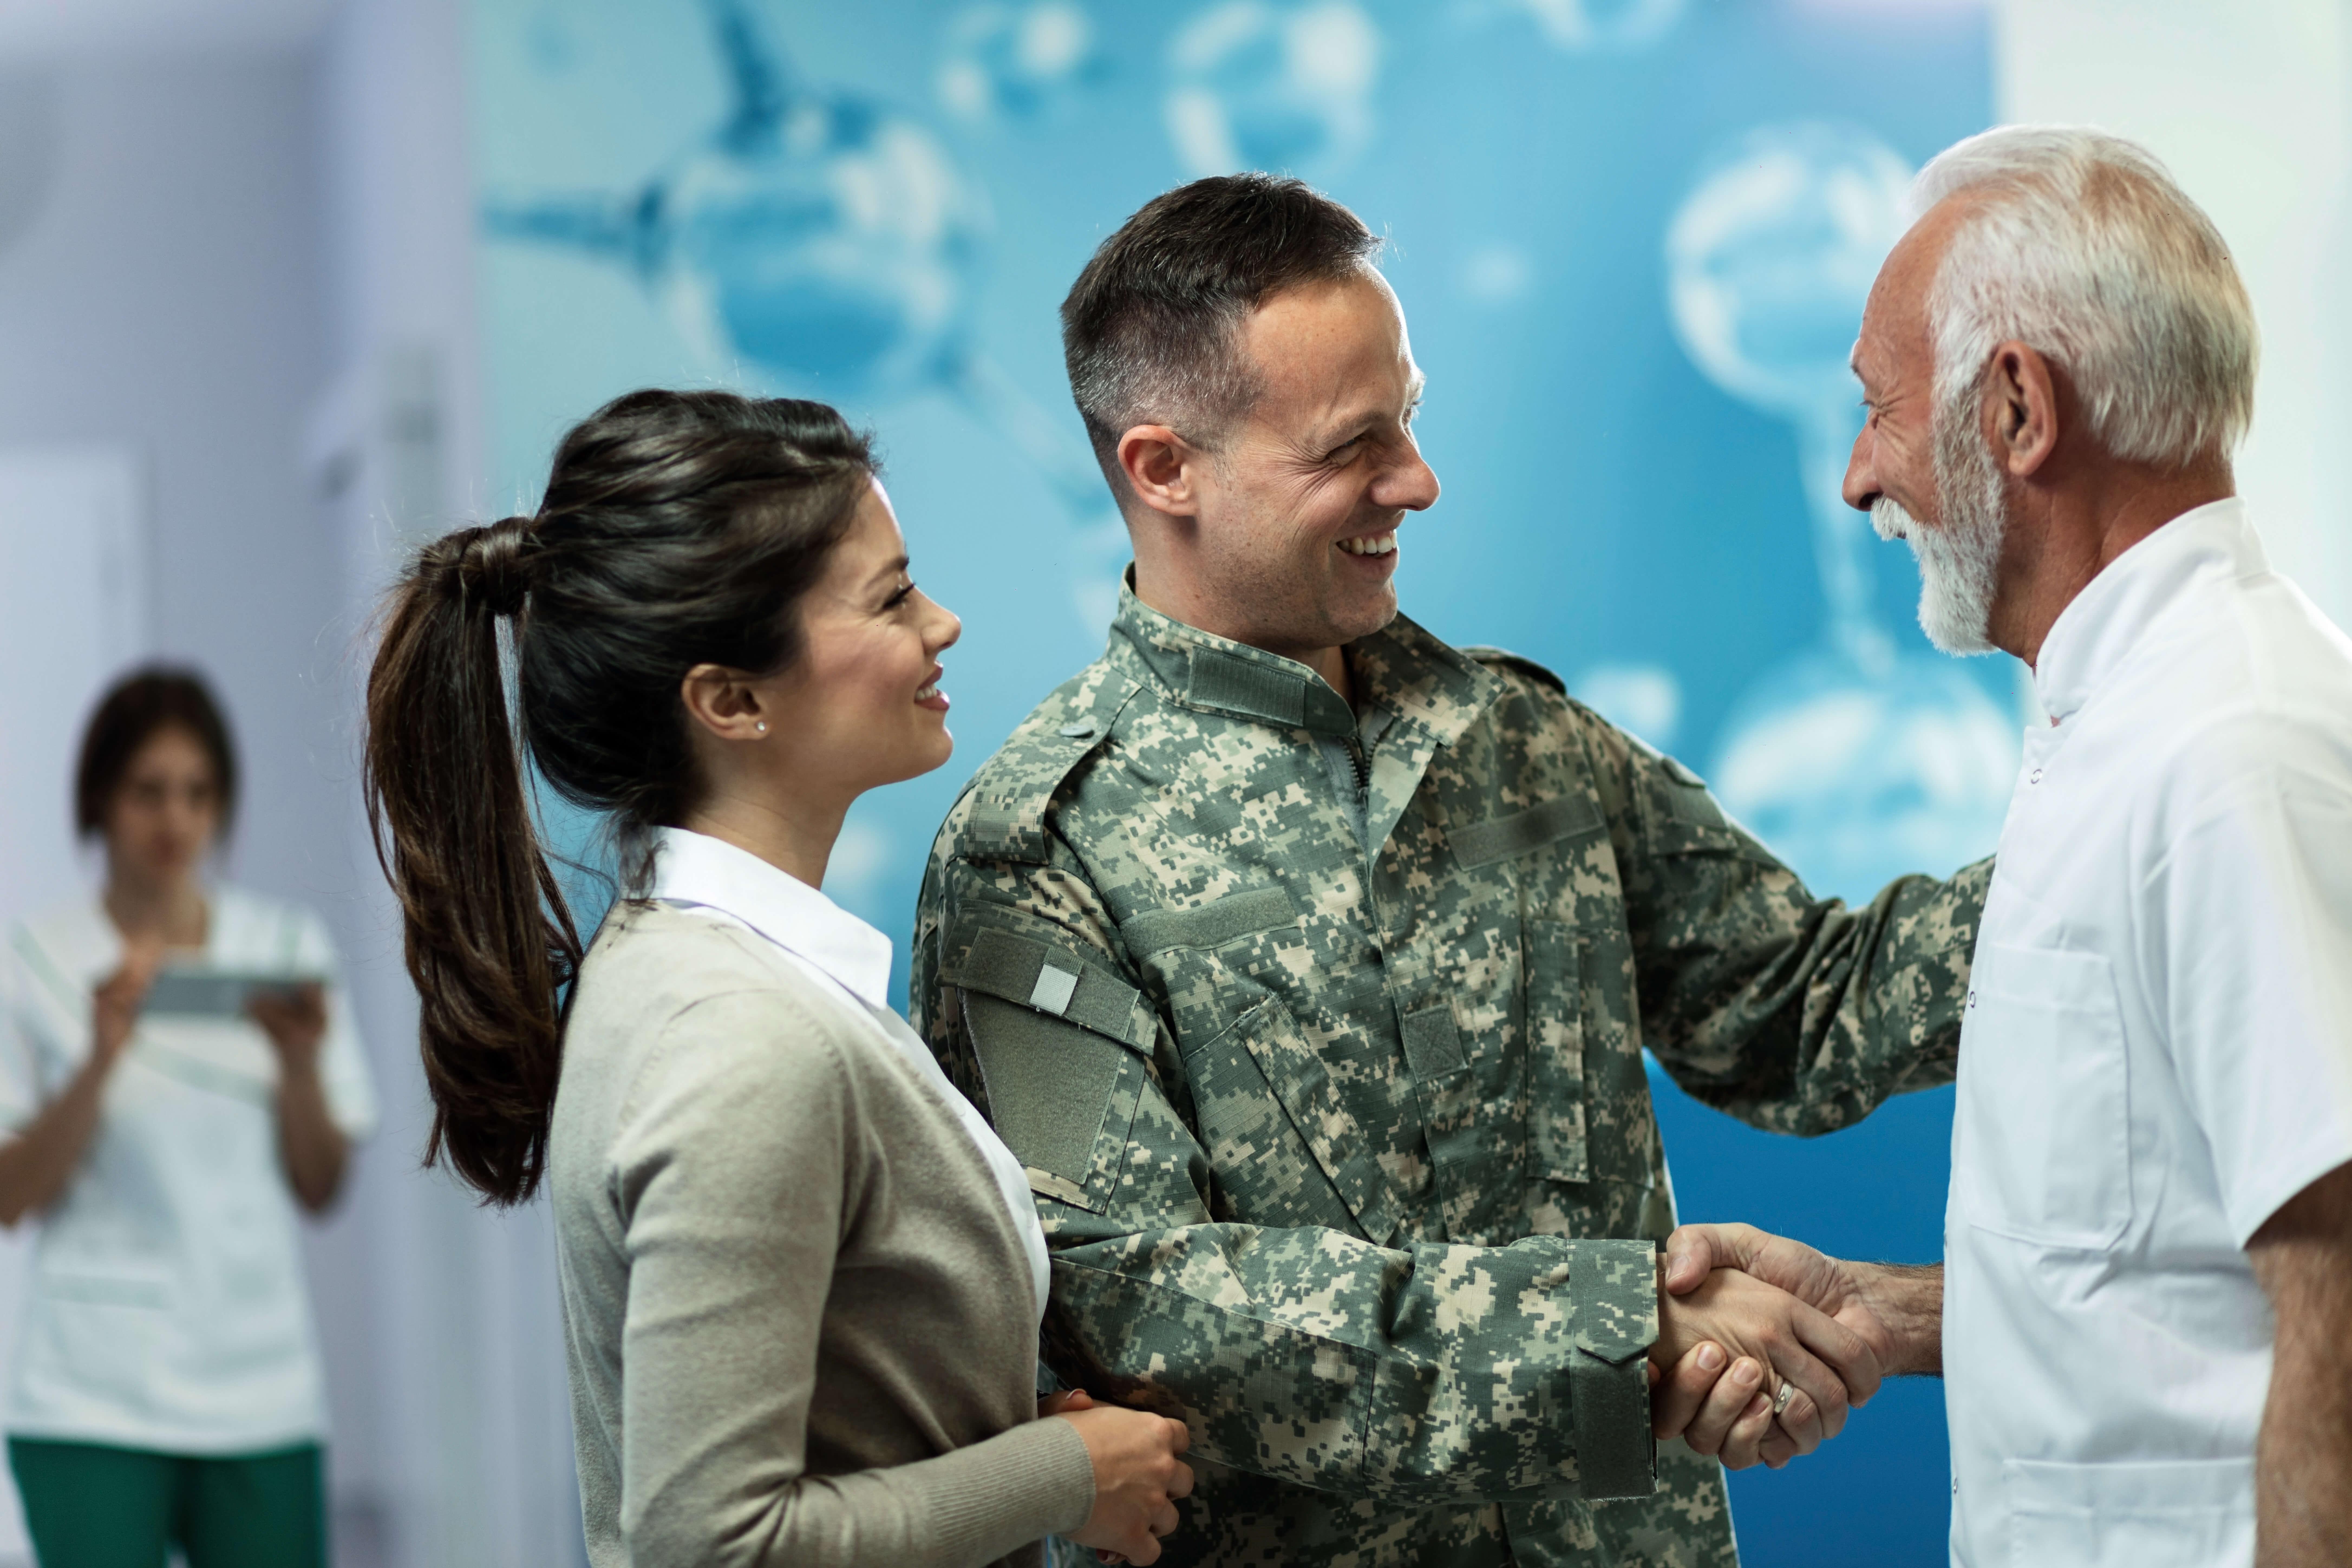 Veteran in uniform greets father.